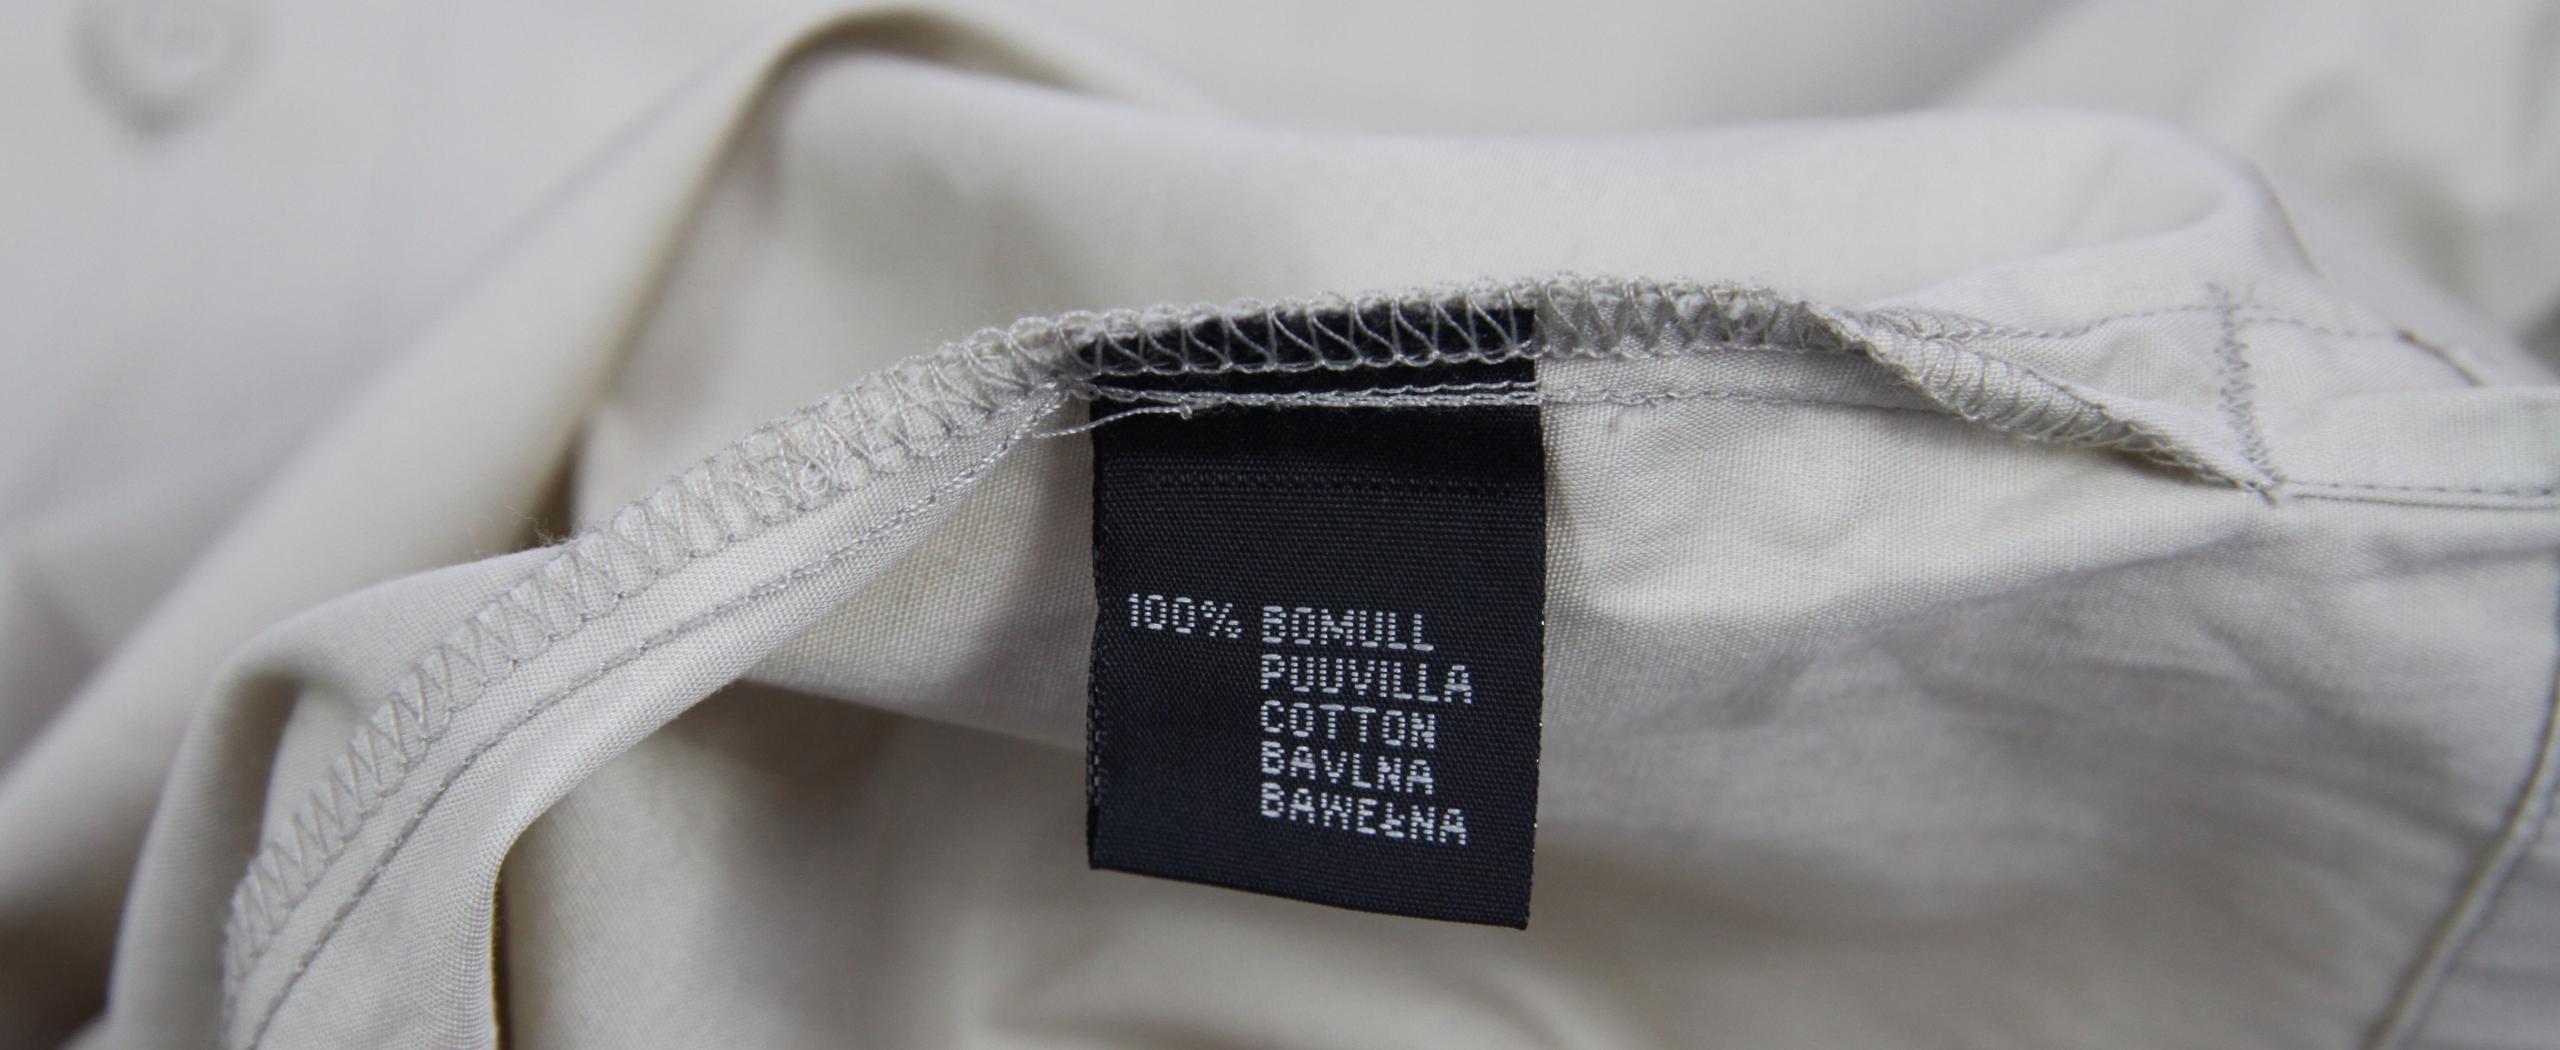 KAPPAhl koszula męska ORYGINALNA beżowa MODNA XXL 9034335236  d2uNb